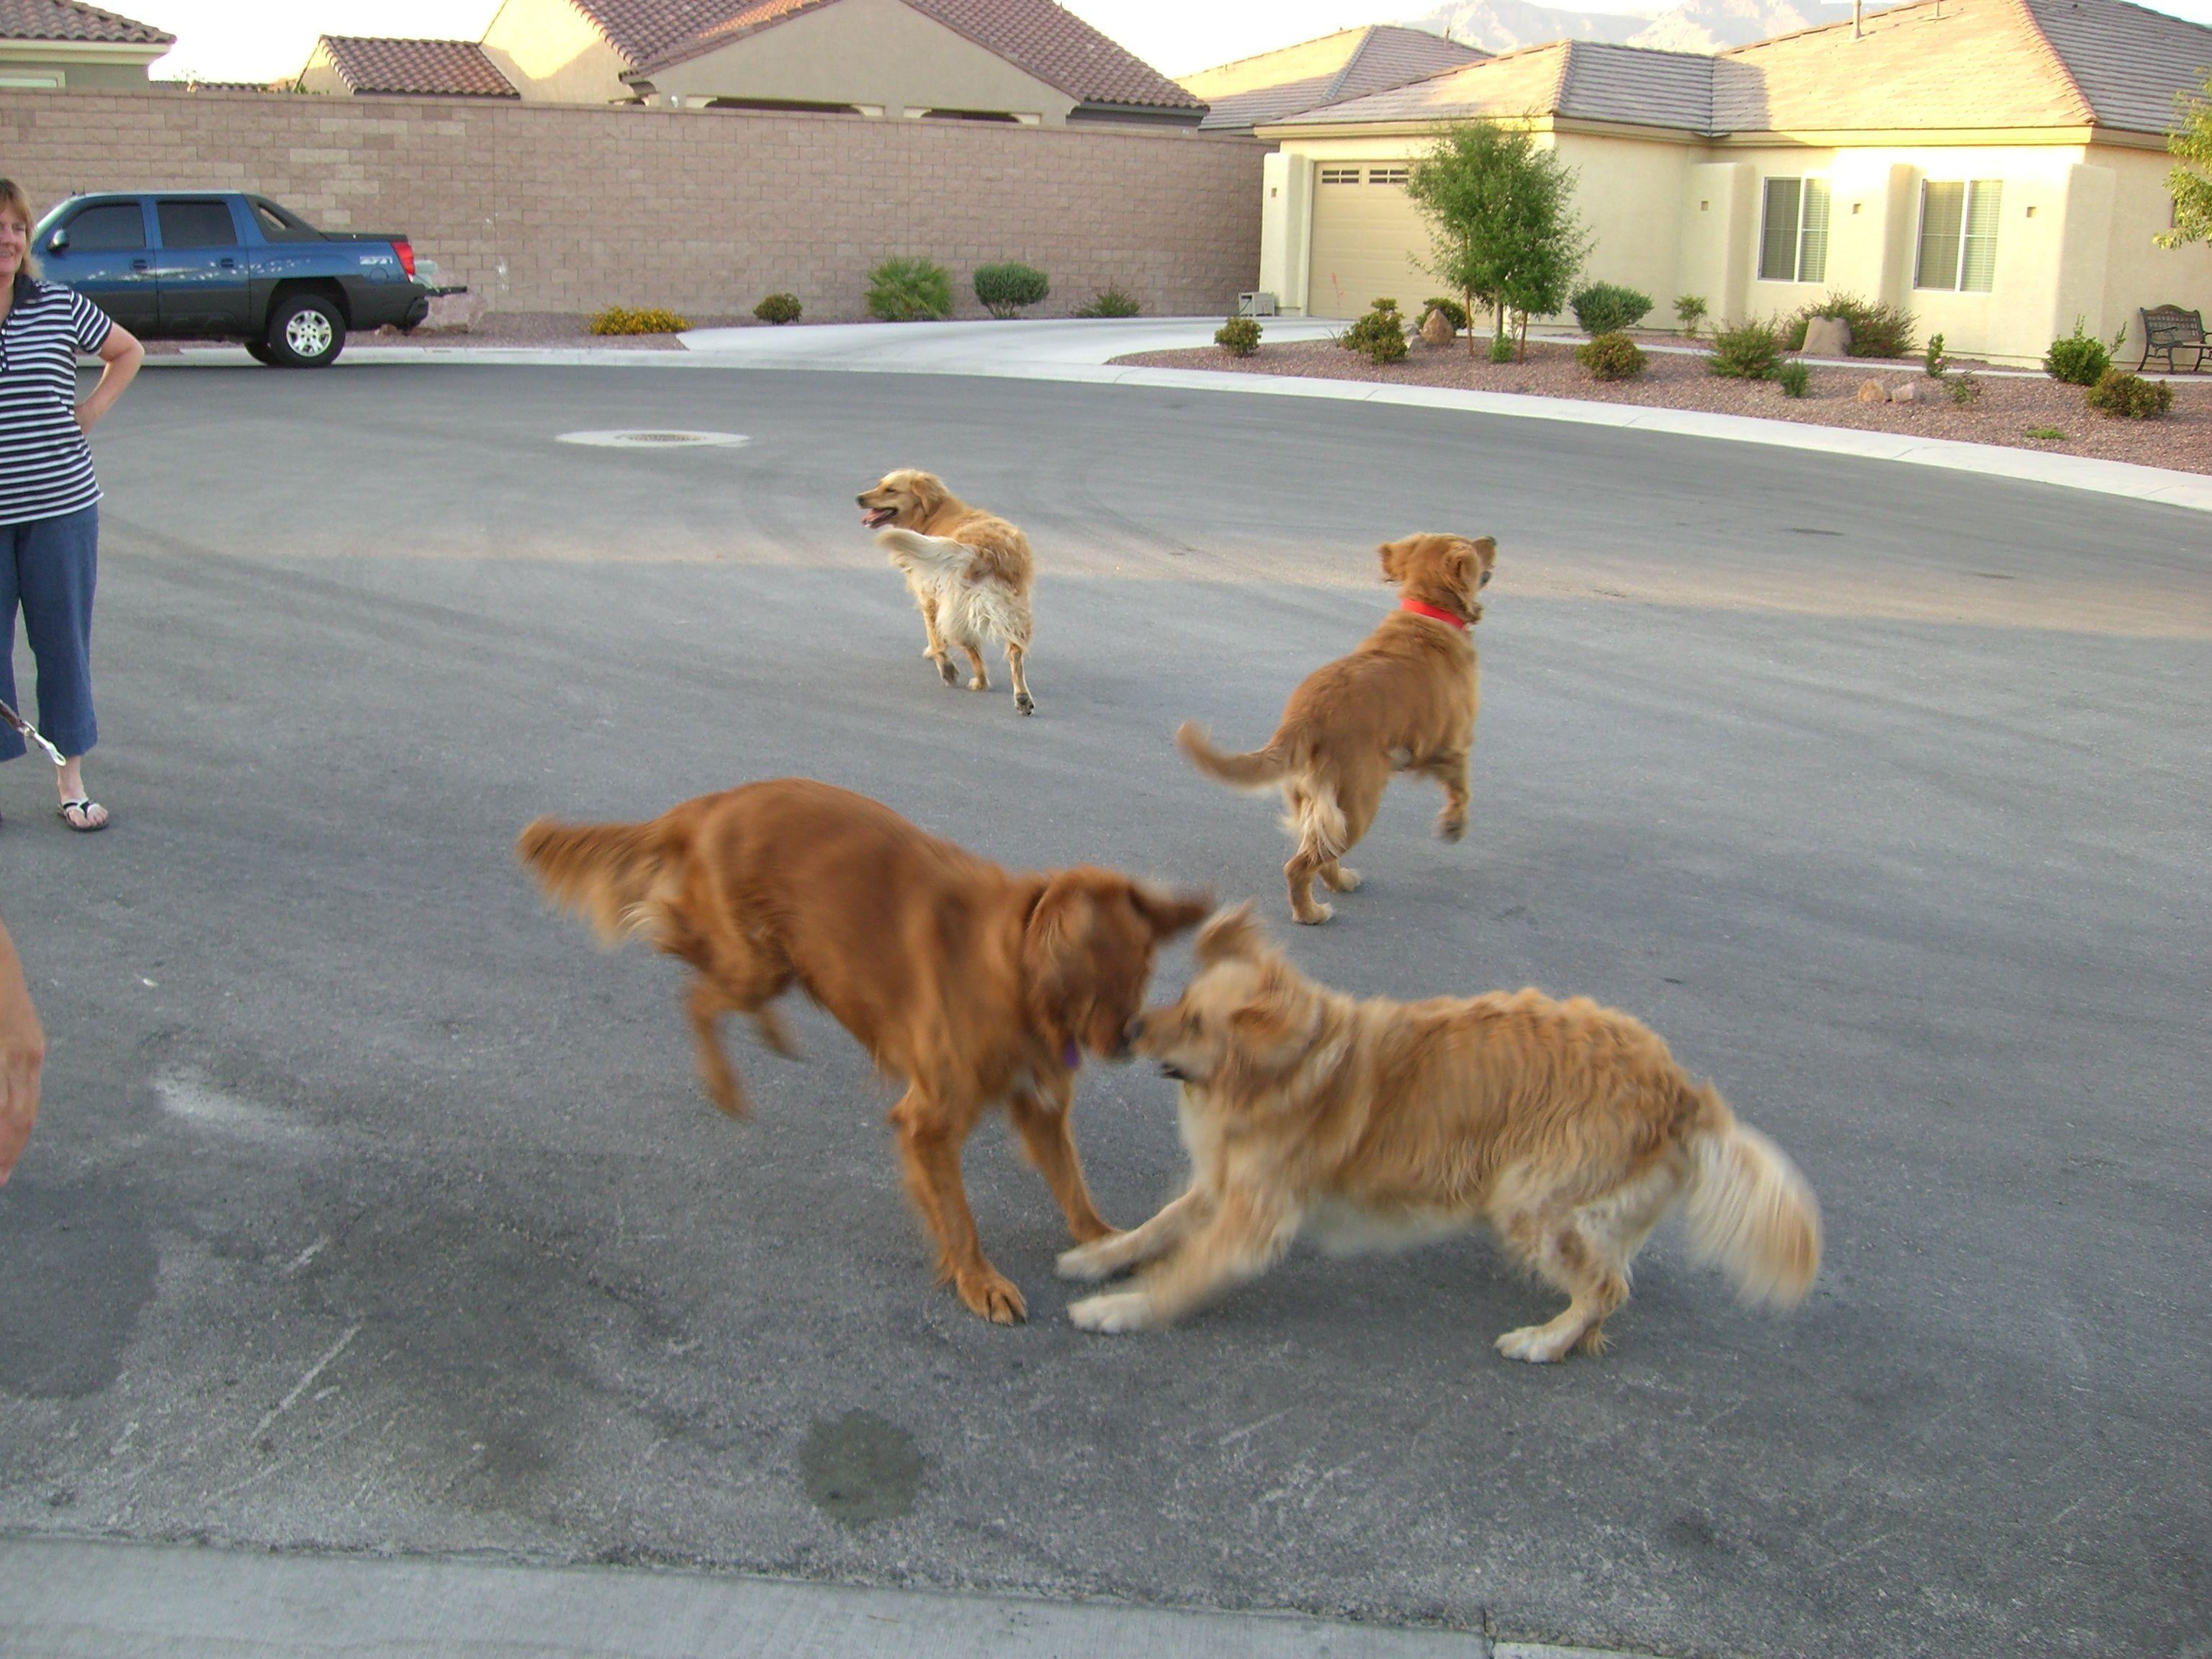 Golden Retriever Play Day Dogs Golden Retriever Animals